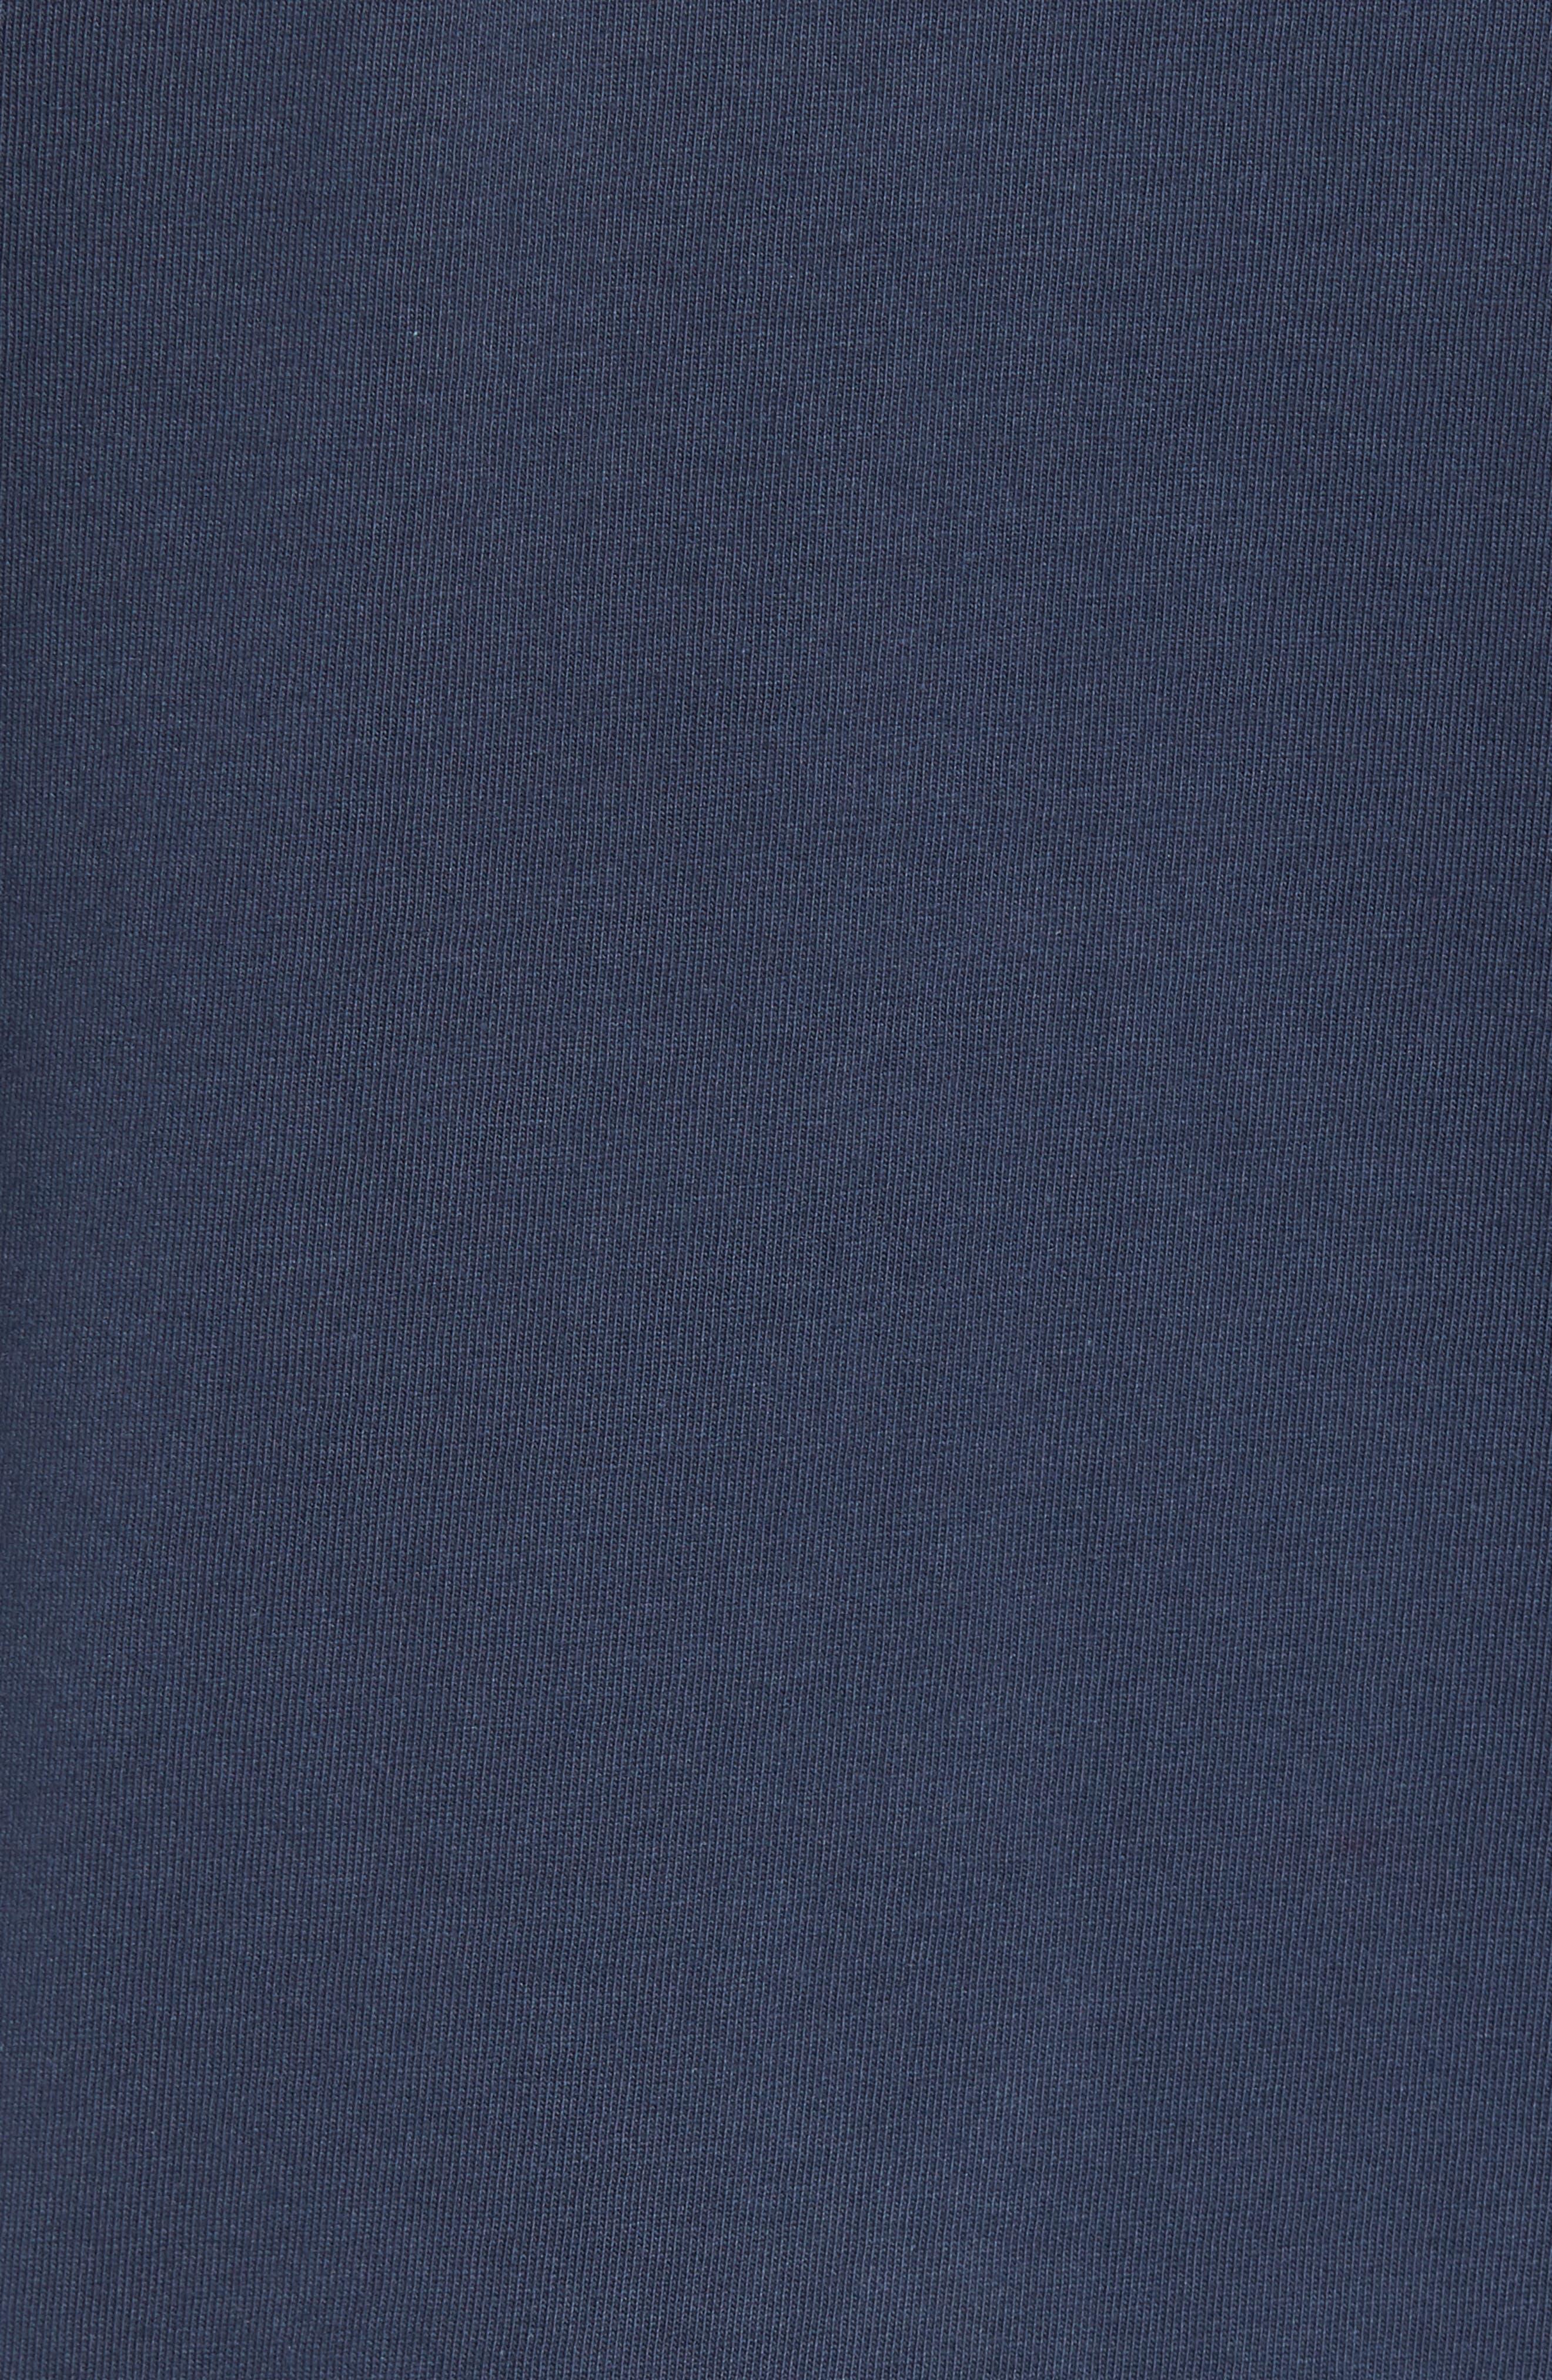 x Shark Week<sup>™</sup> Logo Long Sleeve Pocket T-Shirt,                             Alternate thumbnail 5, color,                             406